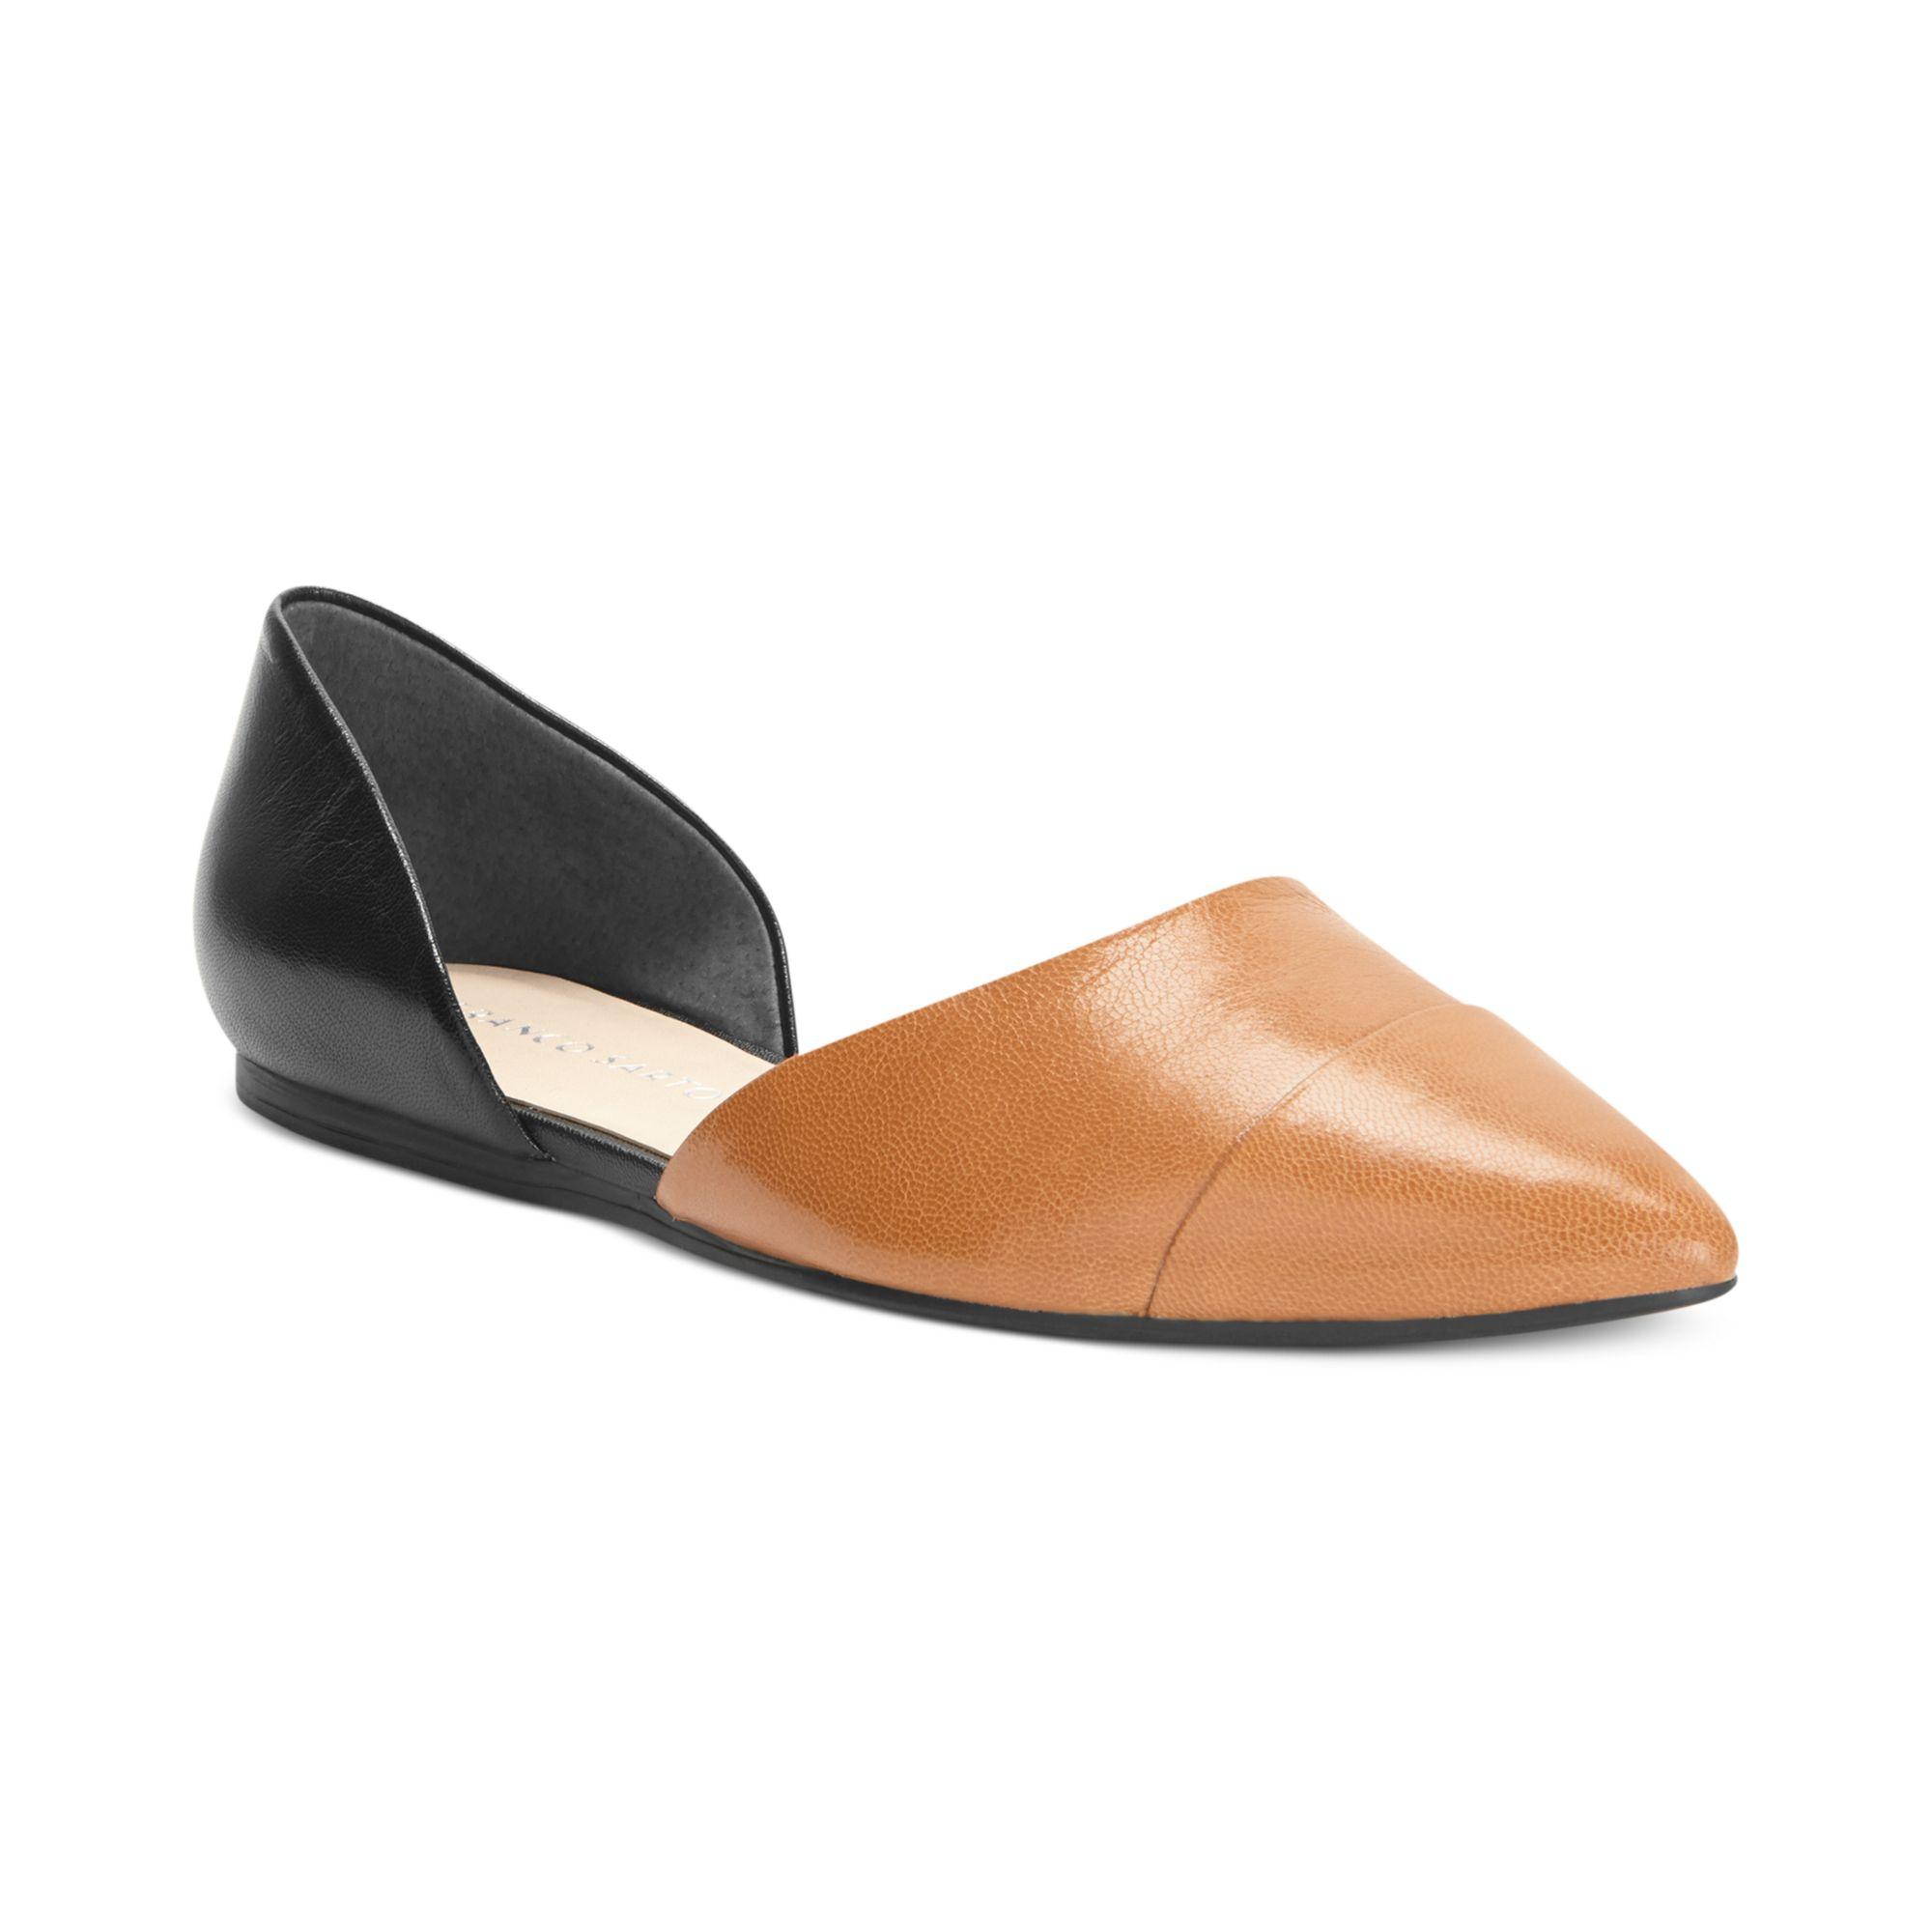 Franco Sarto Flat Shoes